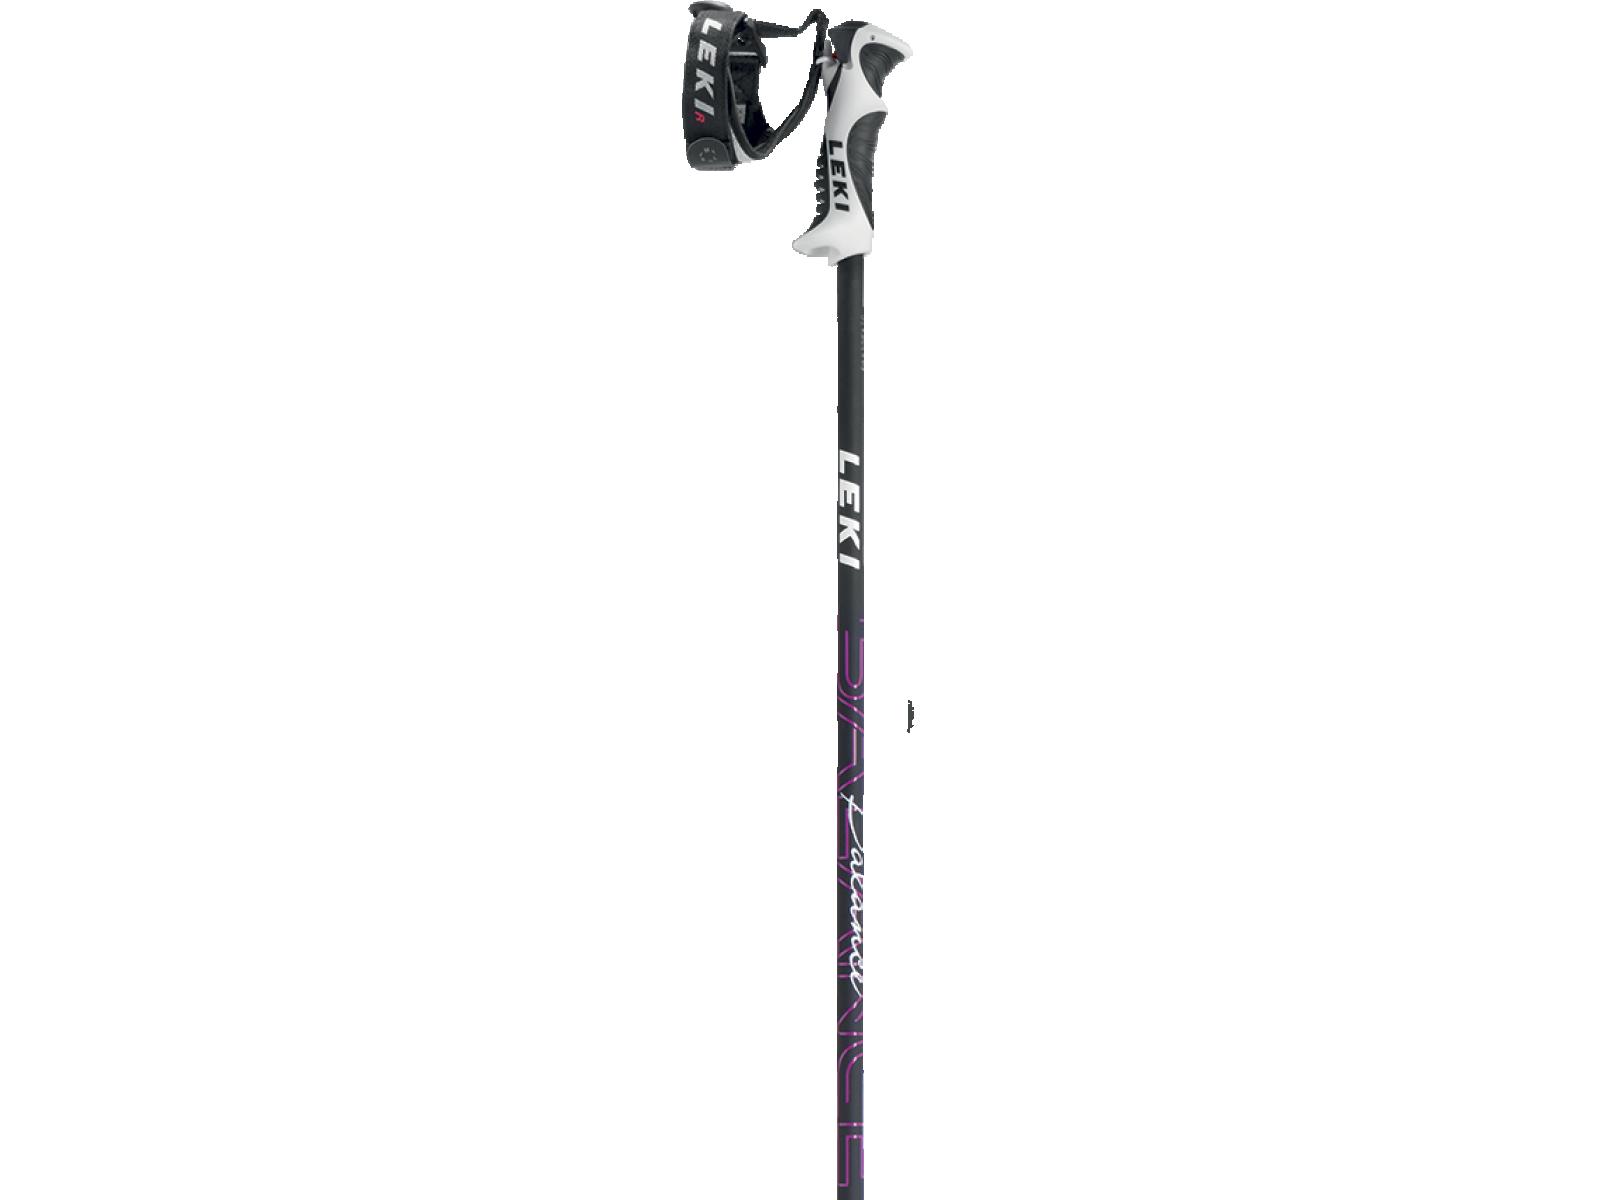 Leki Balance S Délka holí: 105 cm 2015/2016